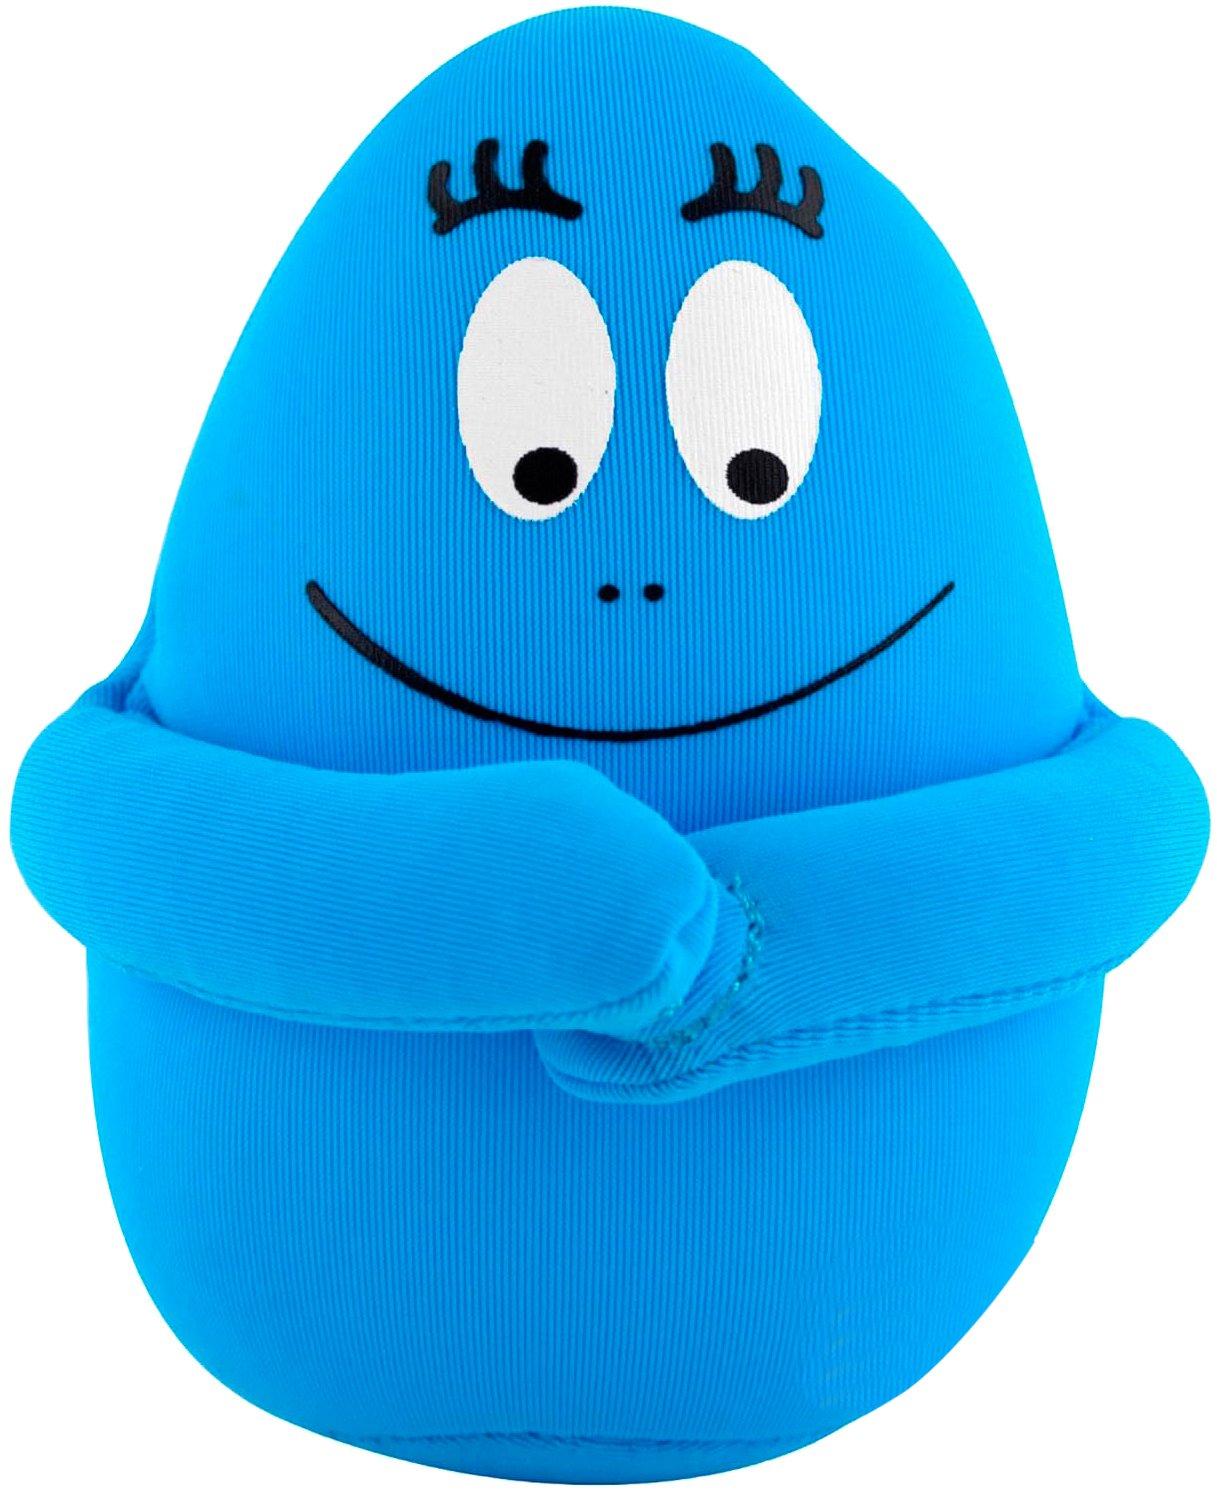 10 cm Bleu Leblon Delienne Coussin Barbapapa